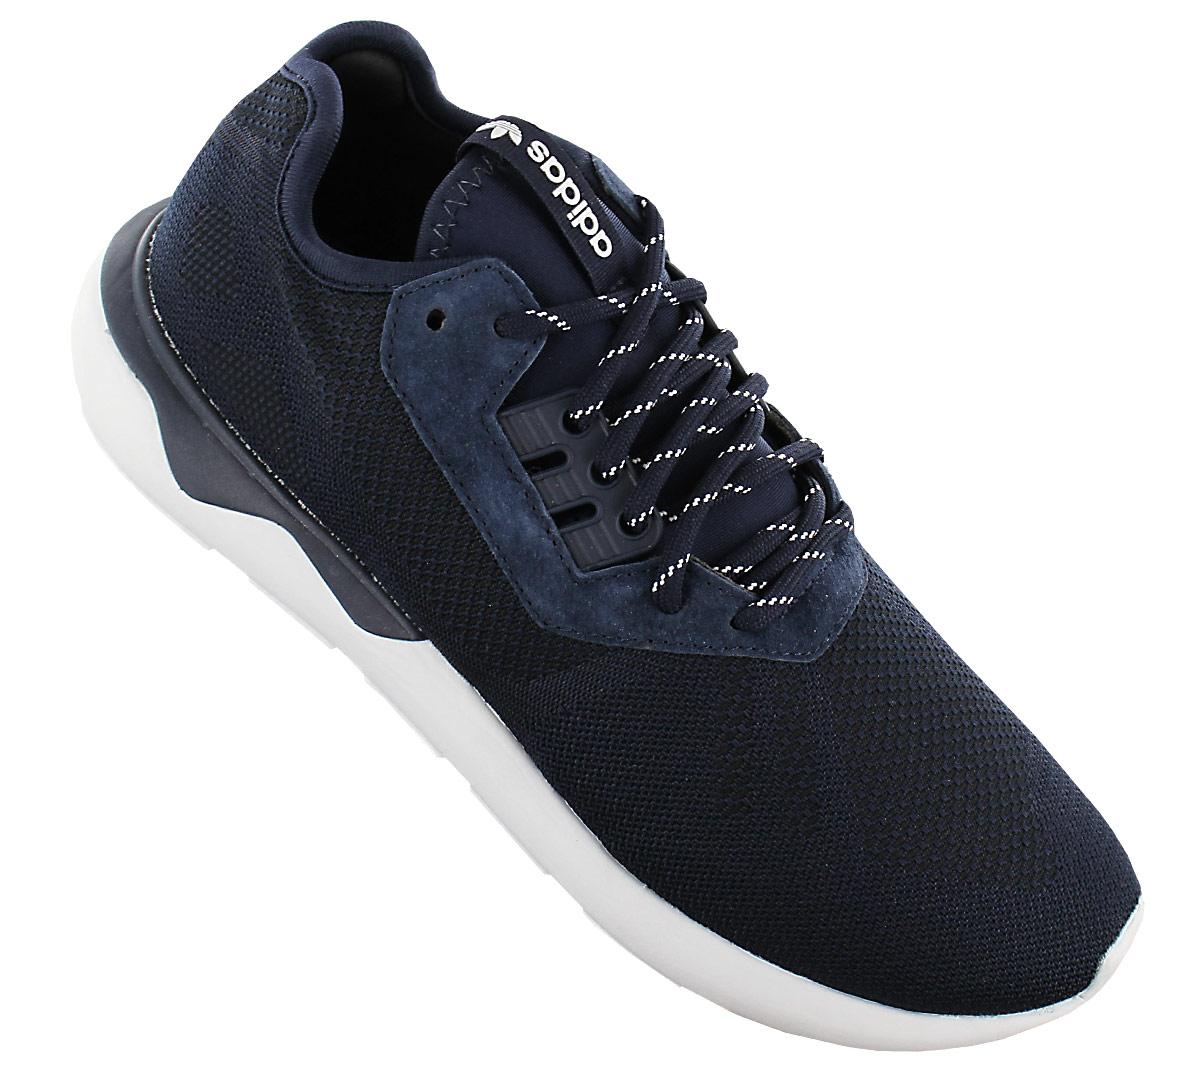 Details about Adidas Originals Tubular Runner Weave Men's Sneaker Shoe Blue B25596